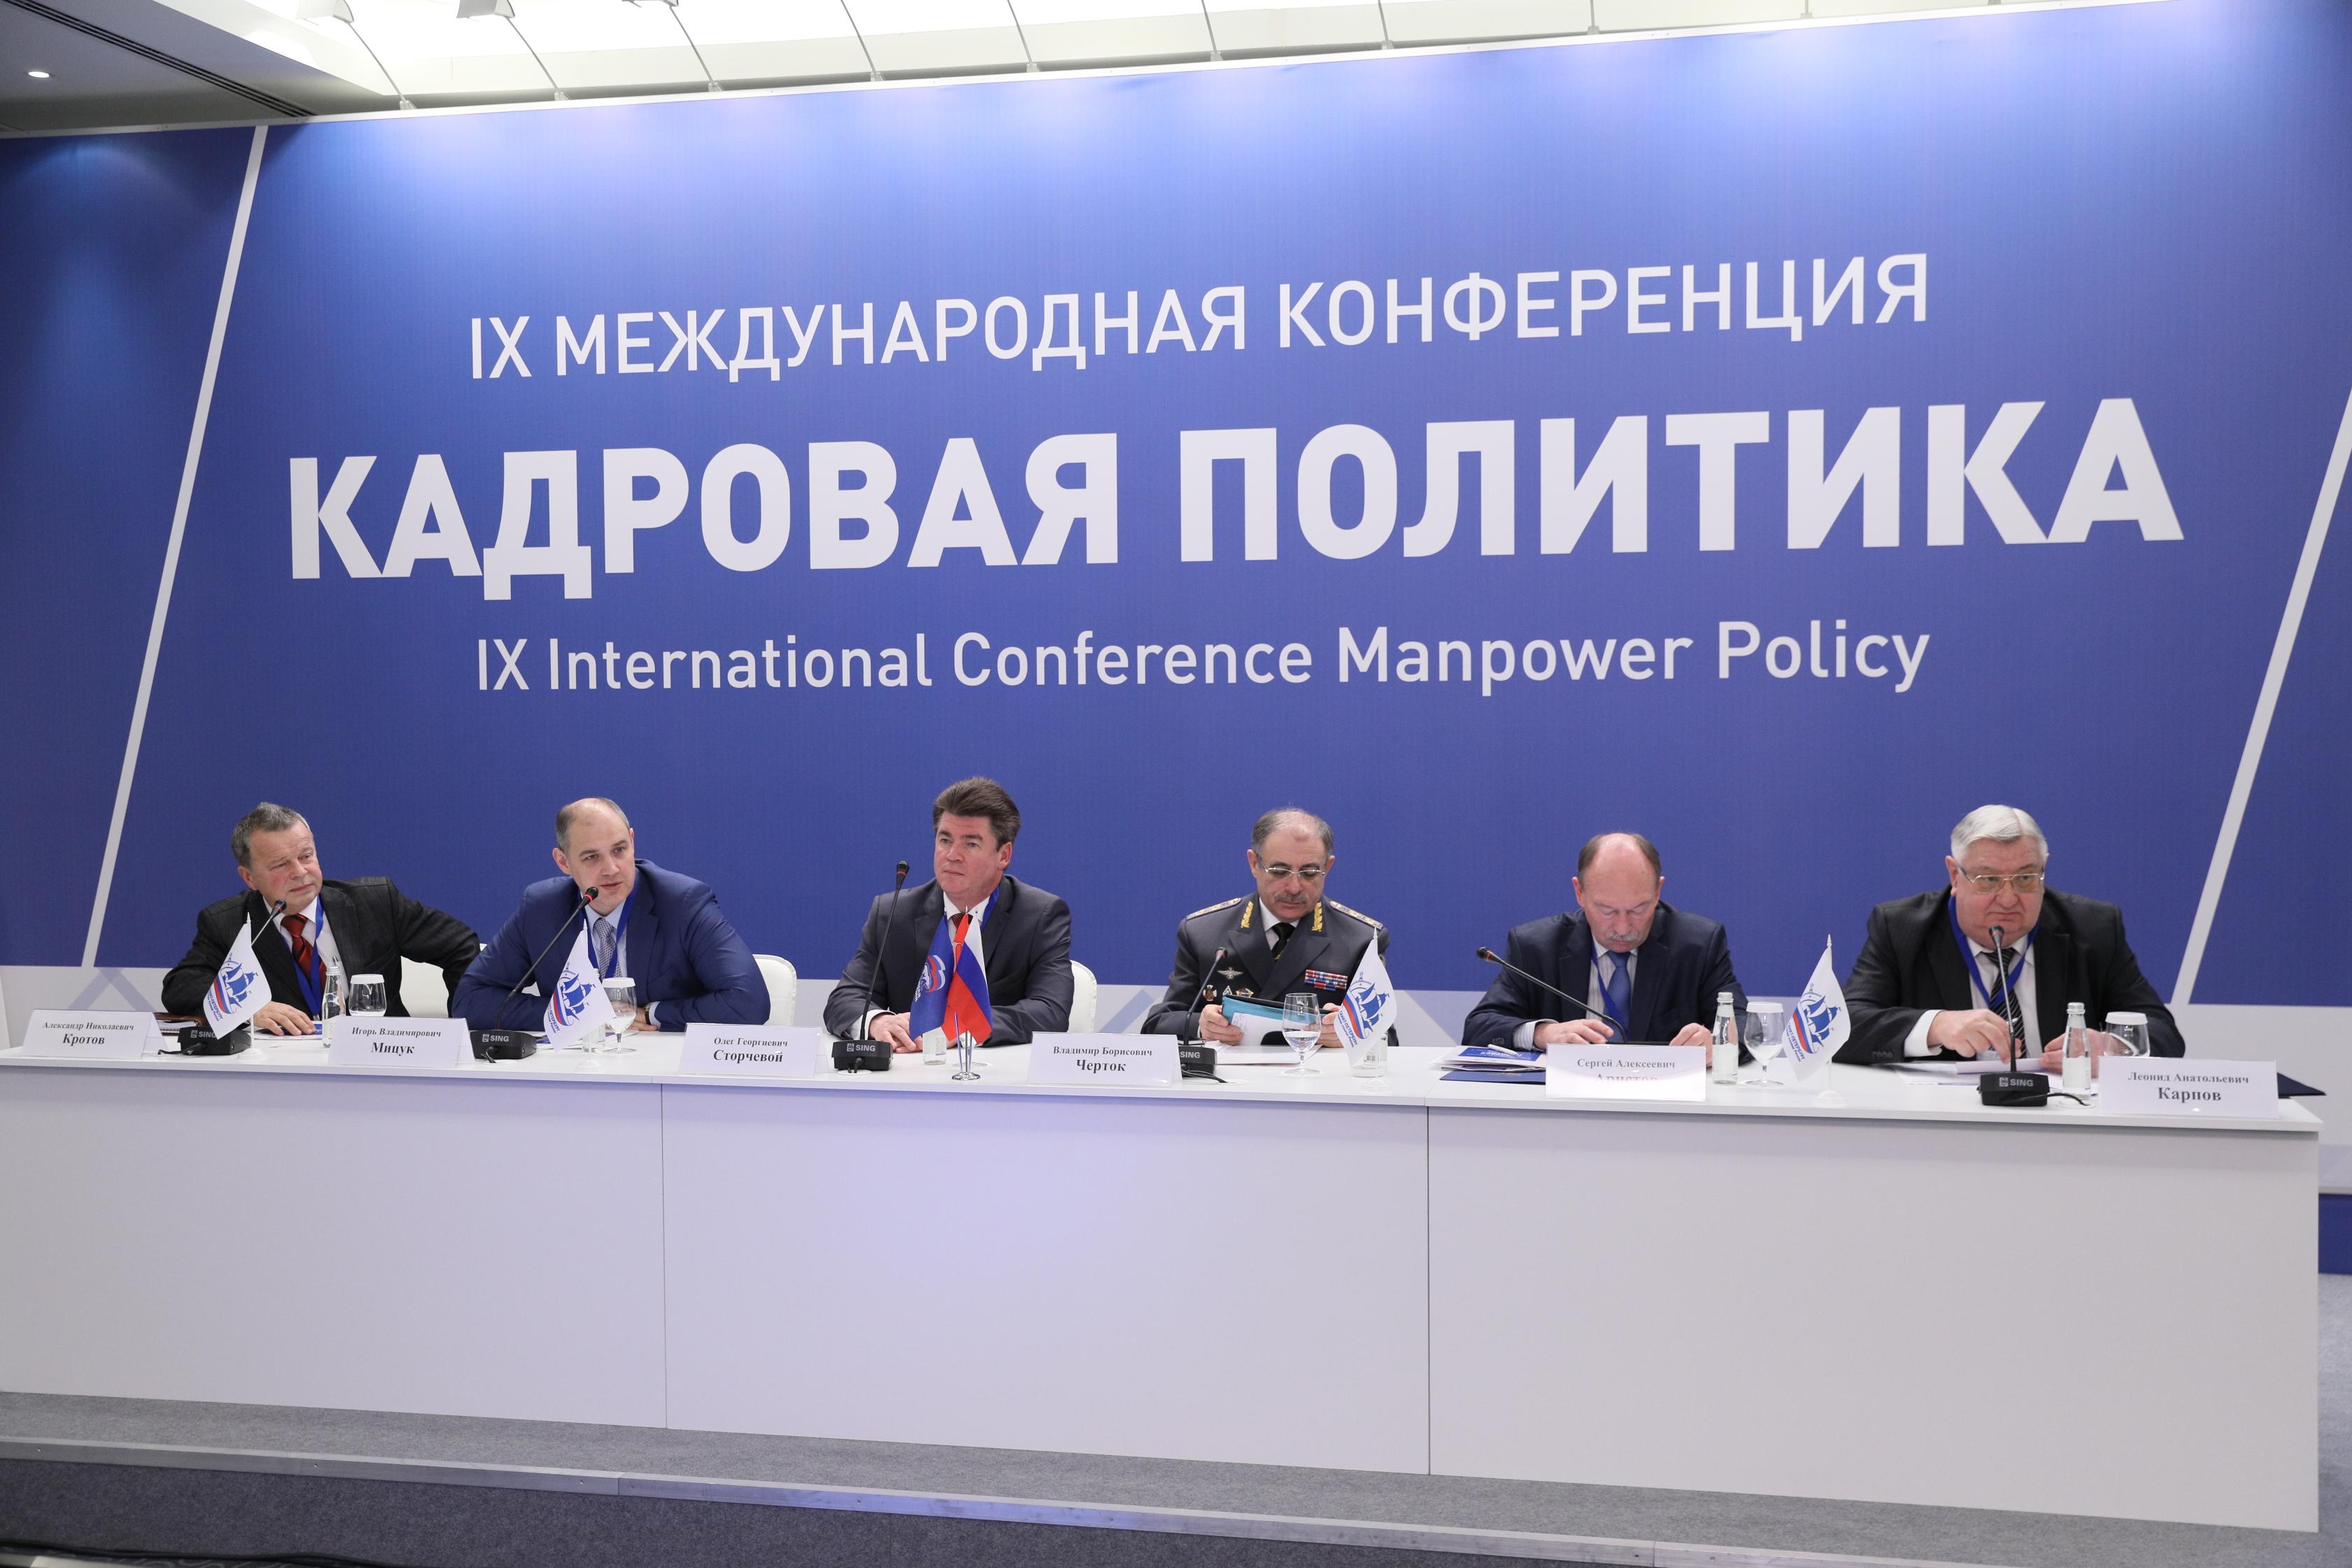 Международная конференция «Кадровая политика» 2016